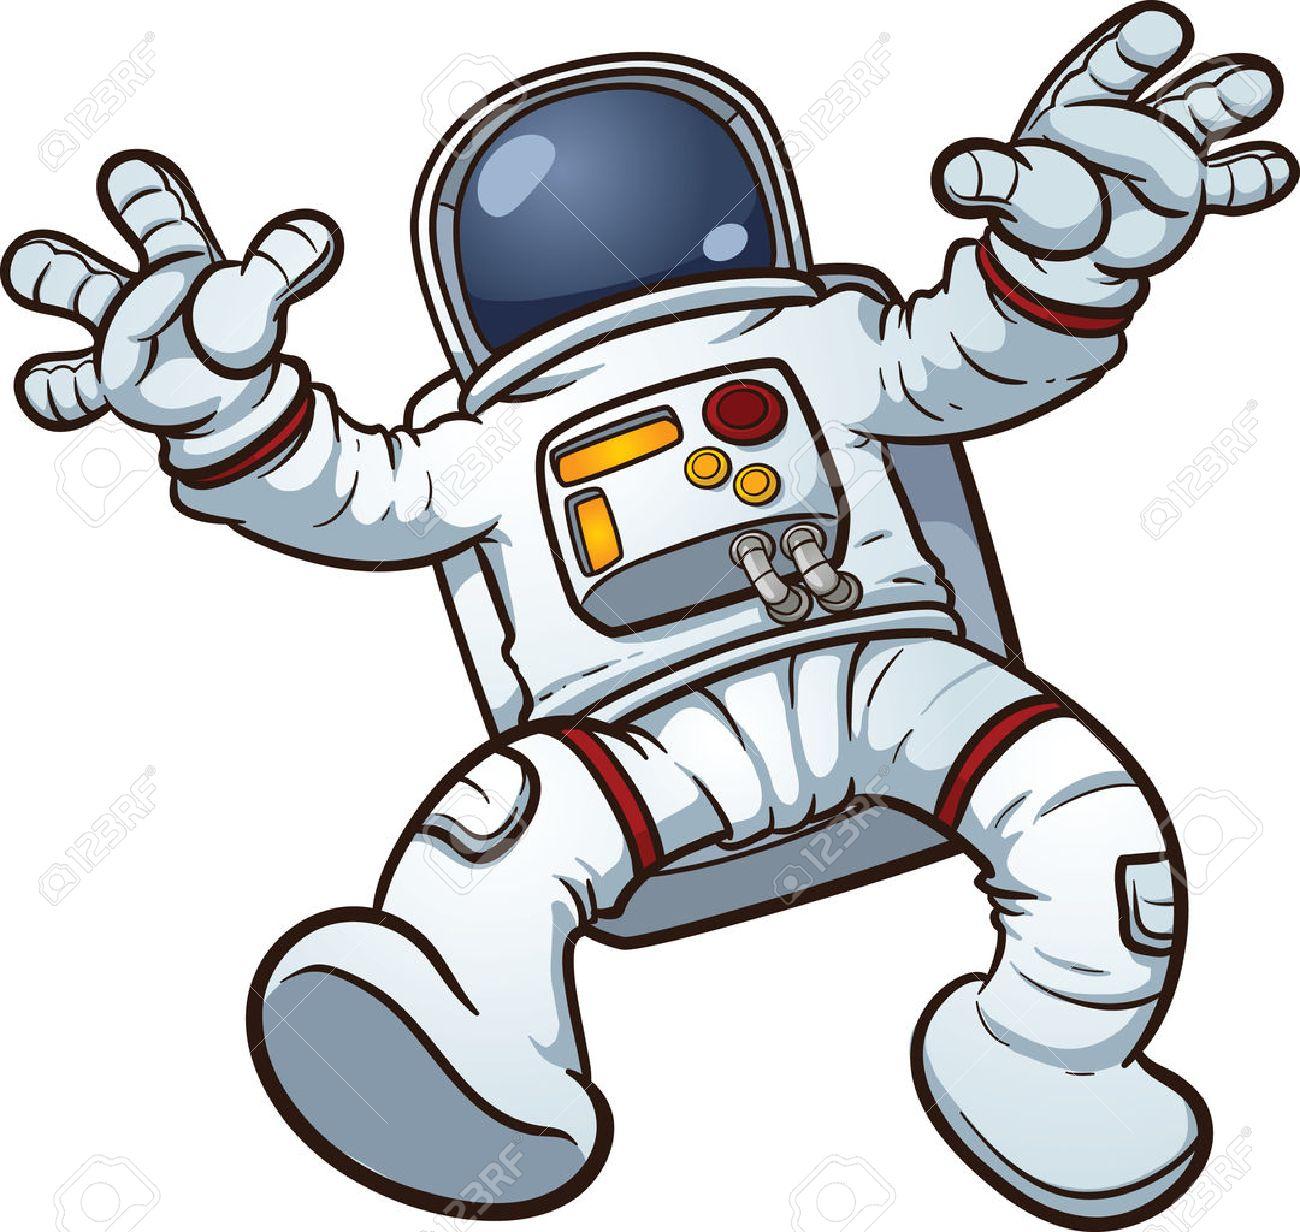 astronaut clip art vector cartoon illustration with simple gradients rh 123rf com